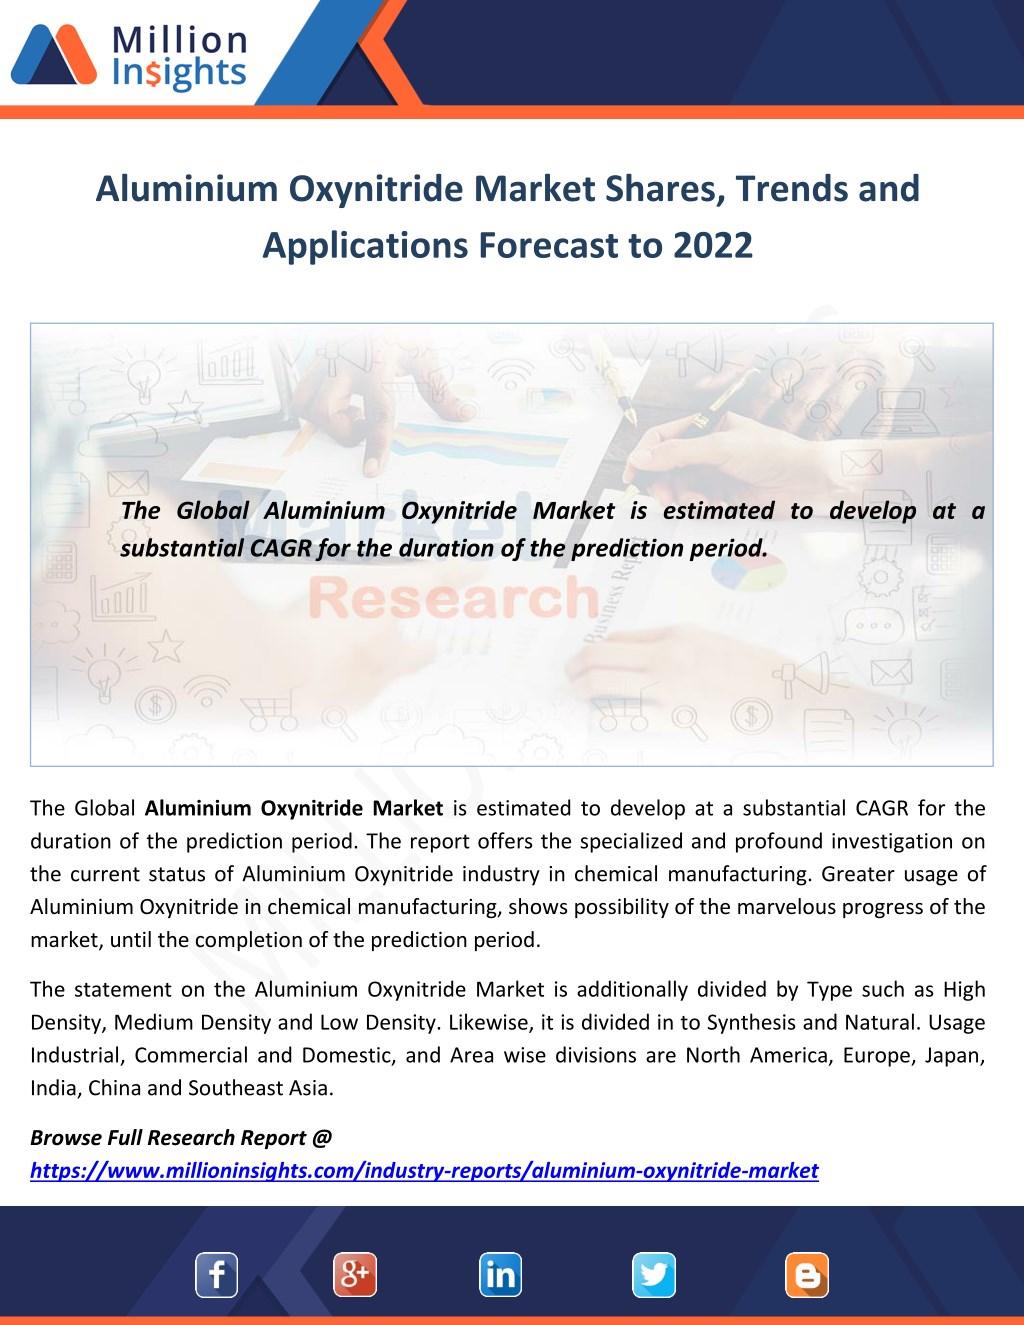 ppt aluminium oxynitride market